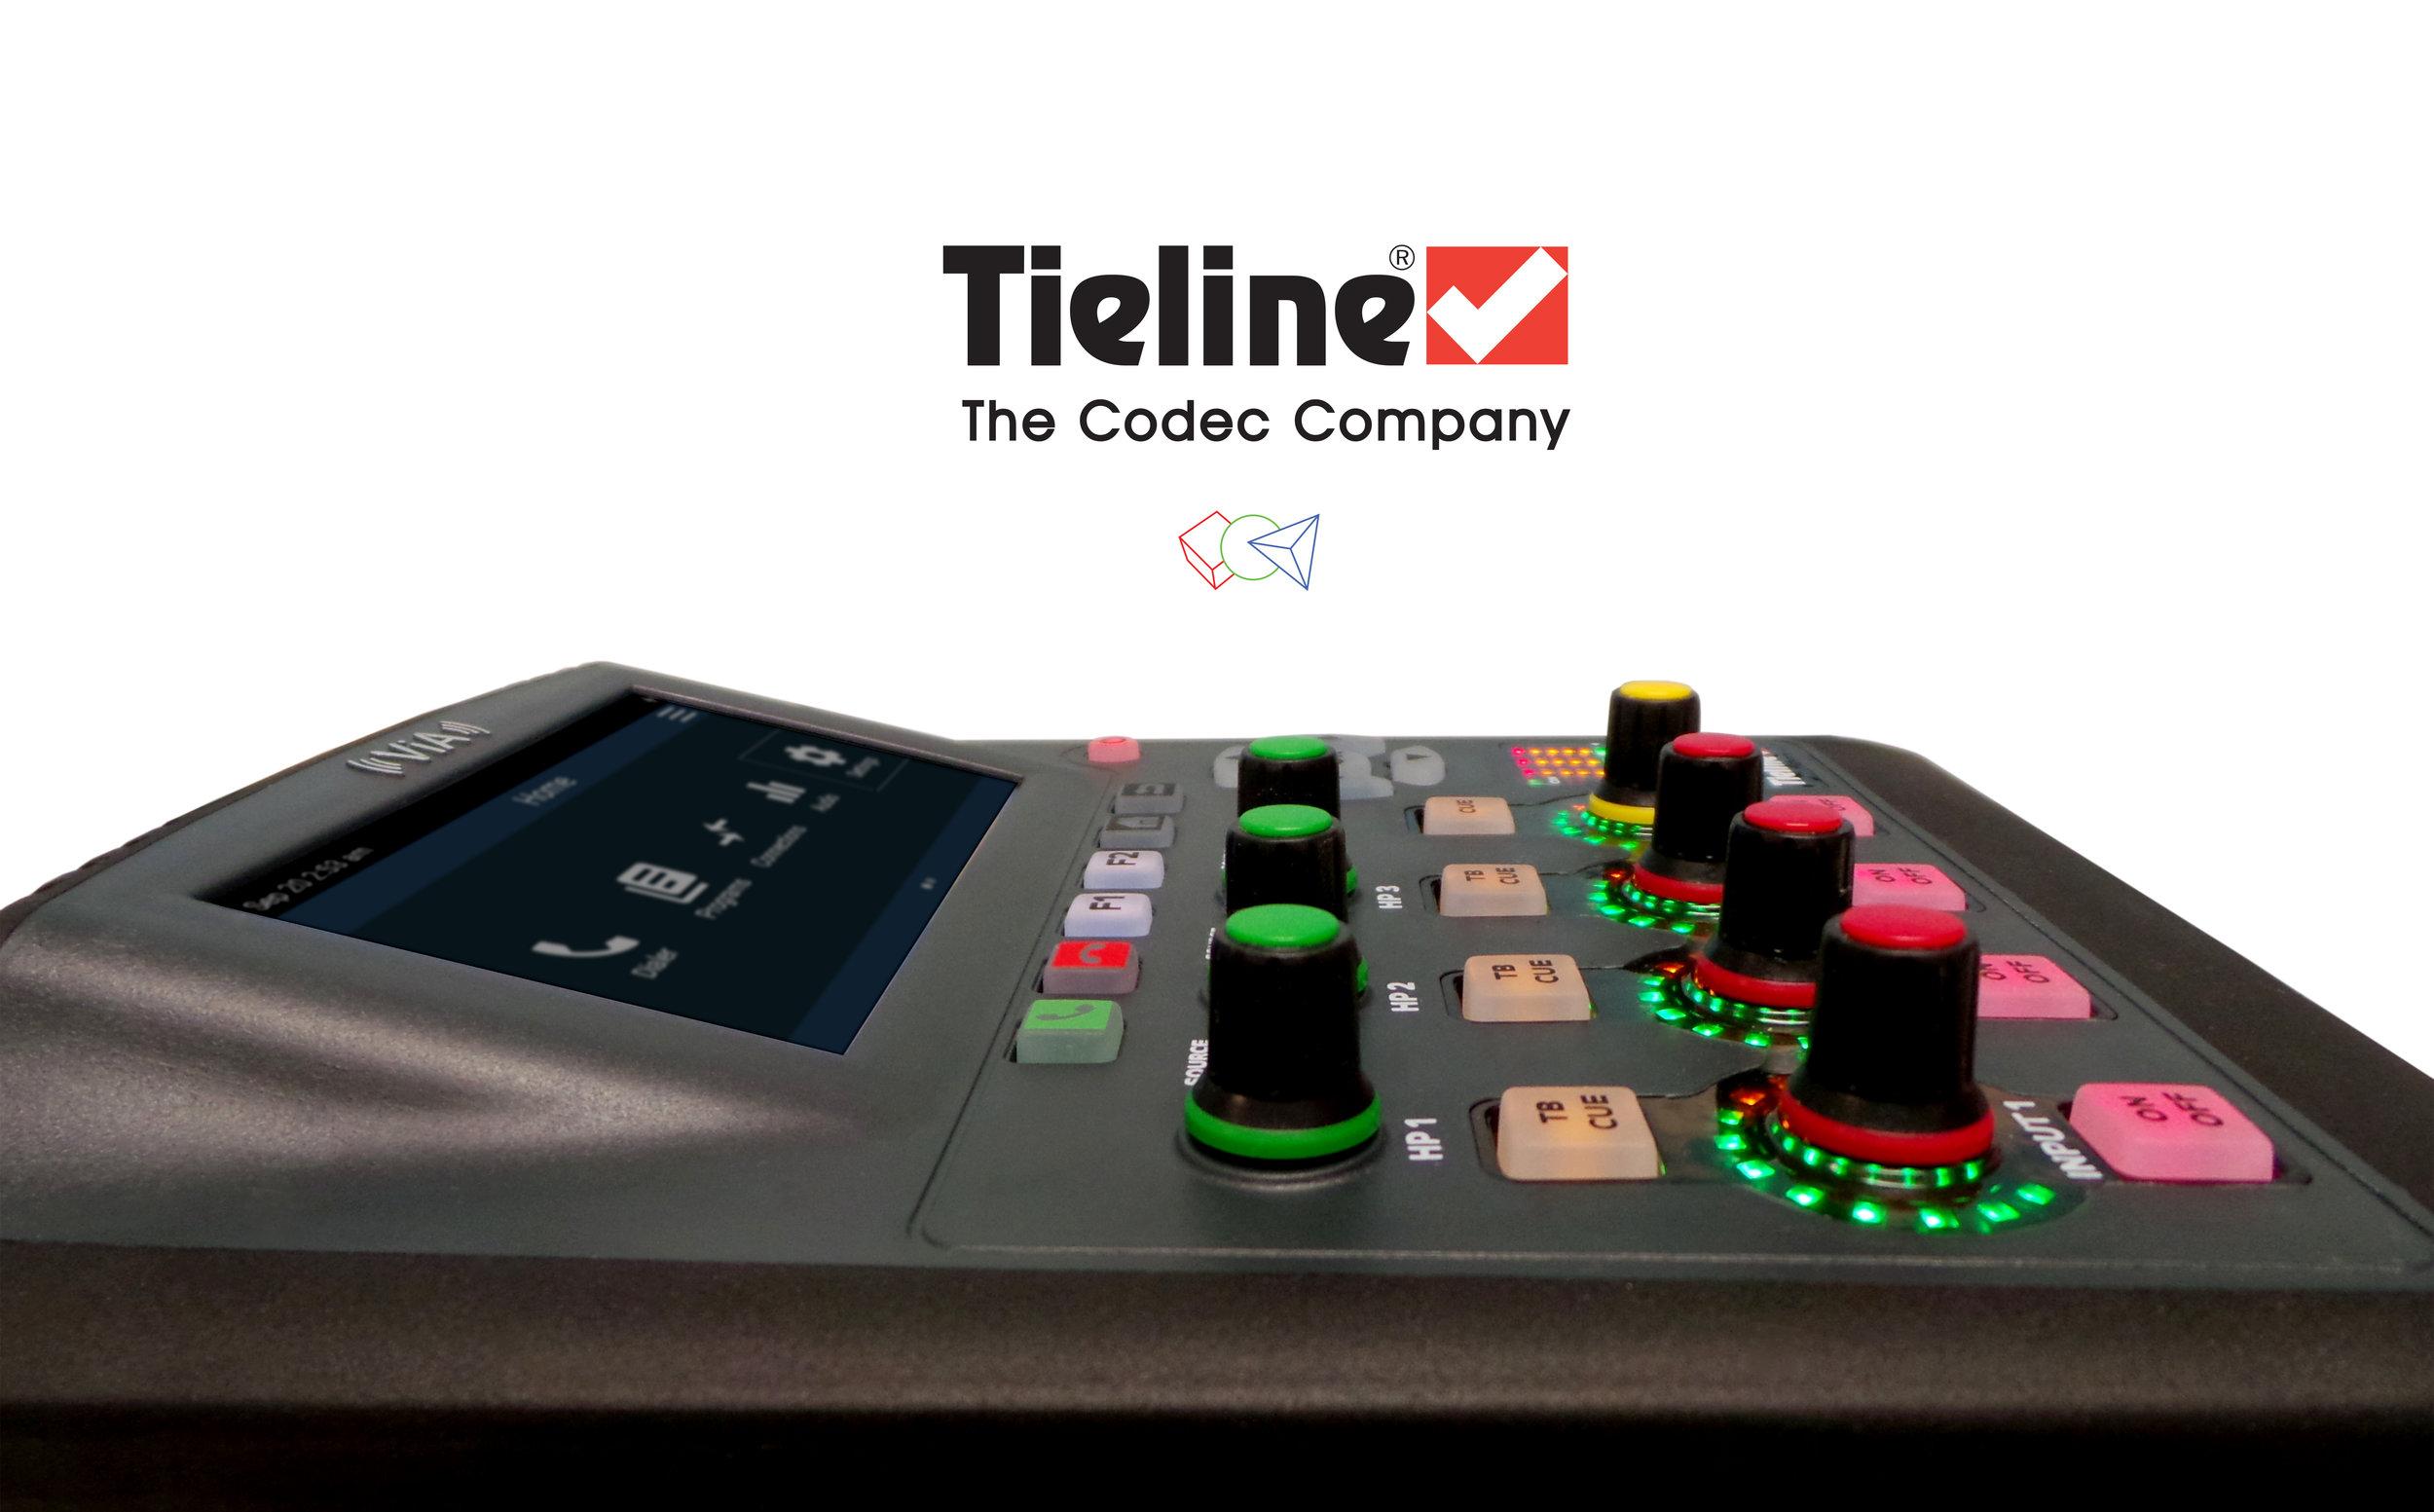 Tieline_3.jpg